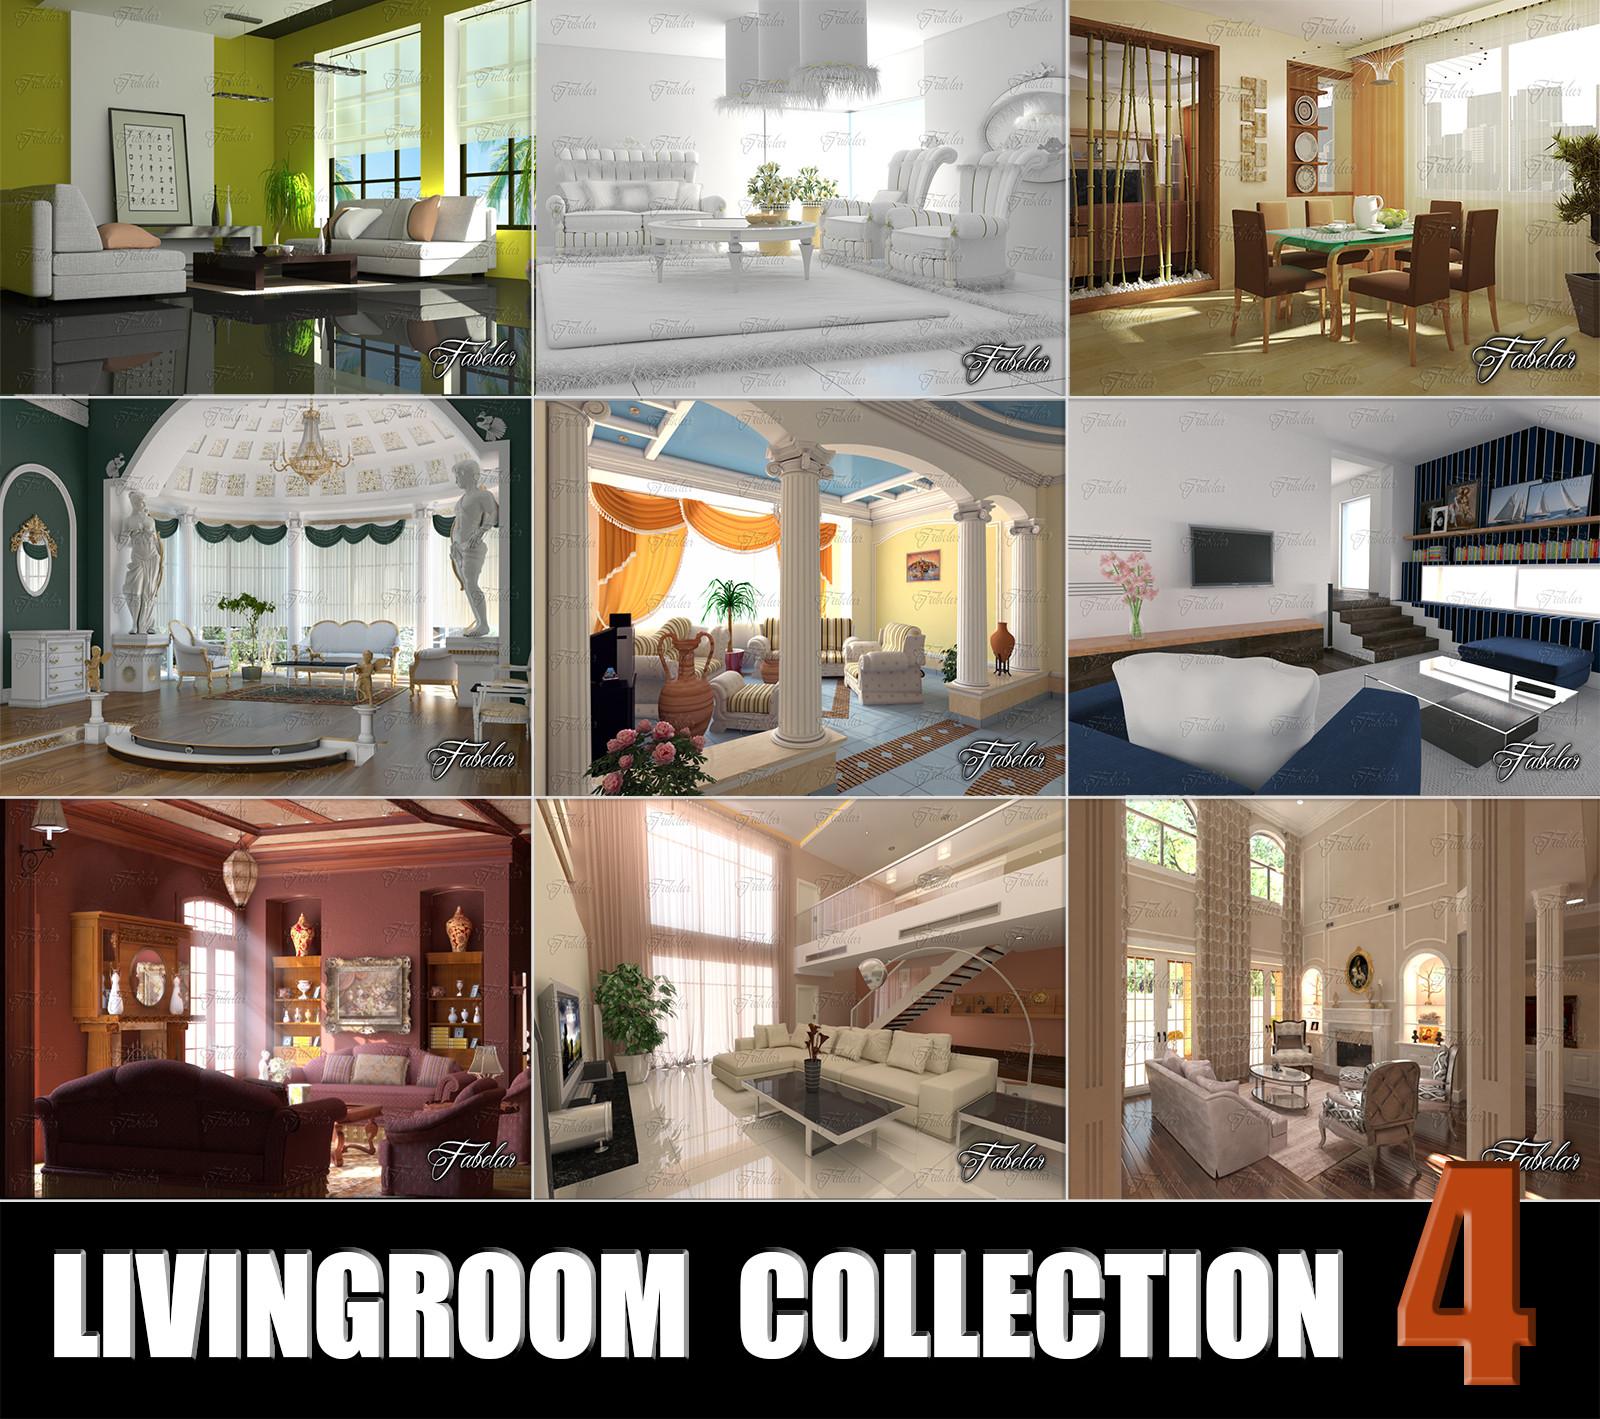 livingcoll4.jpg